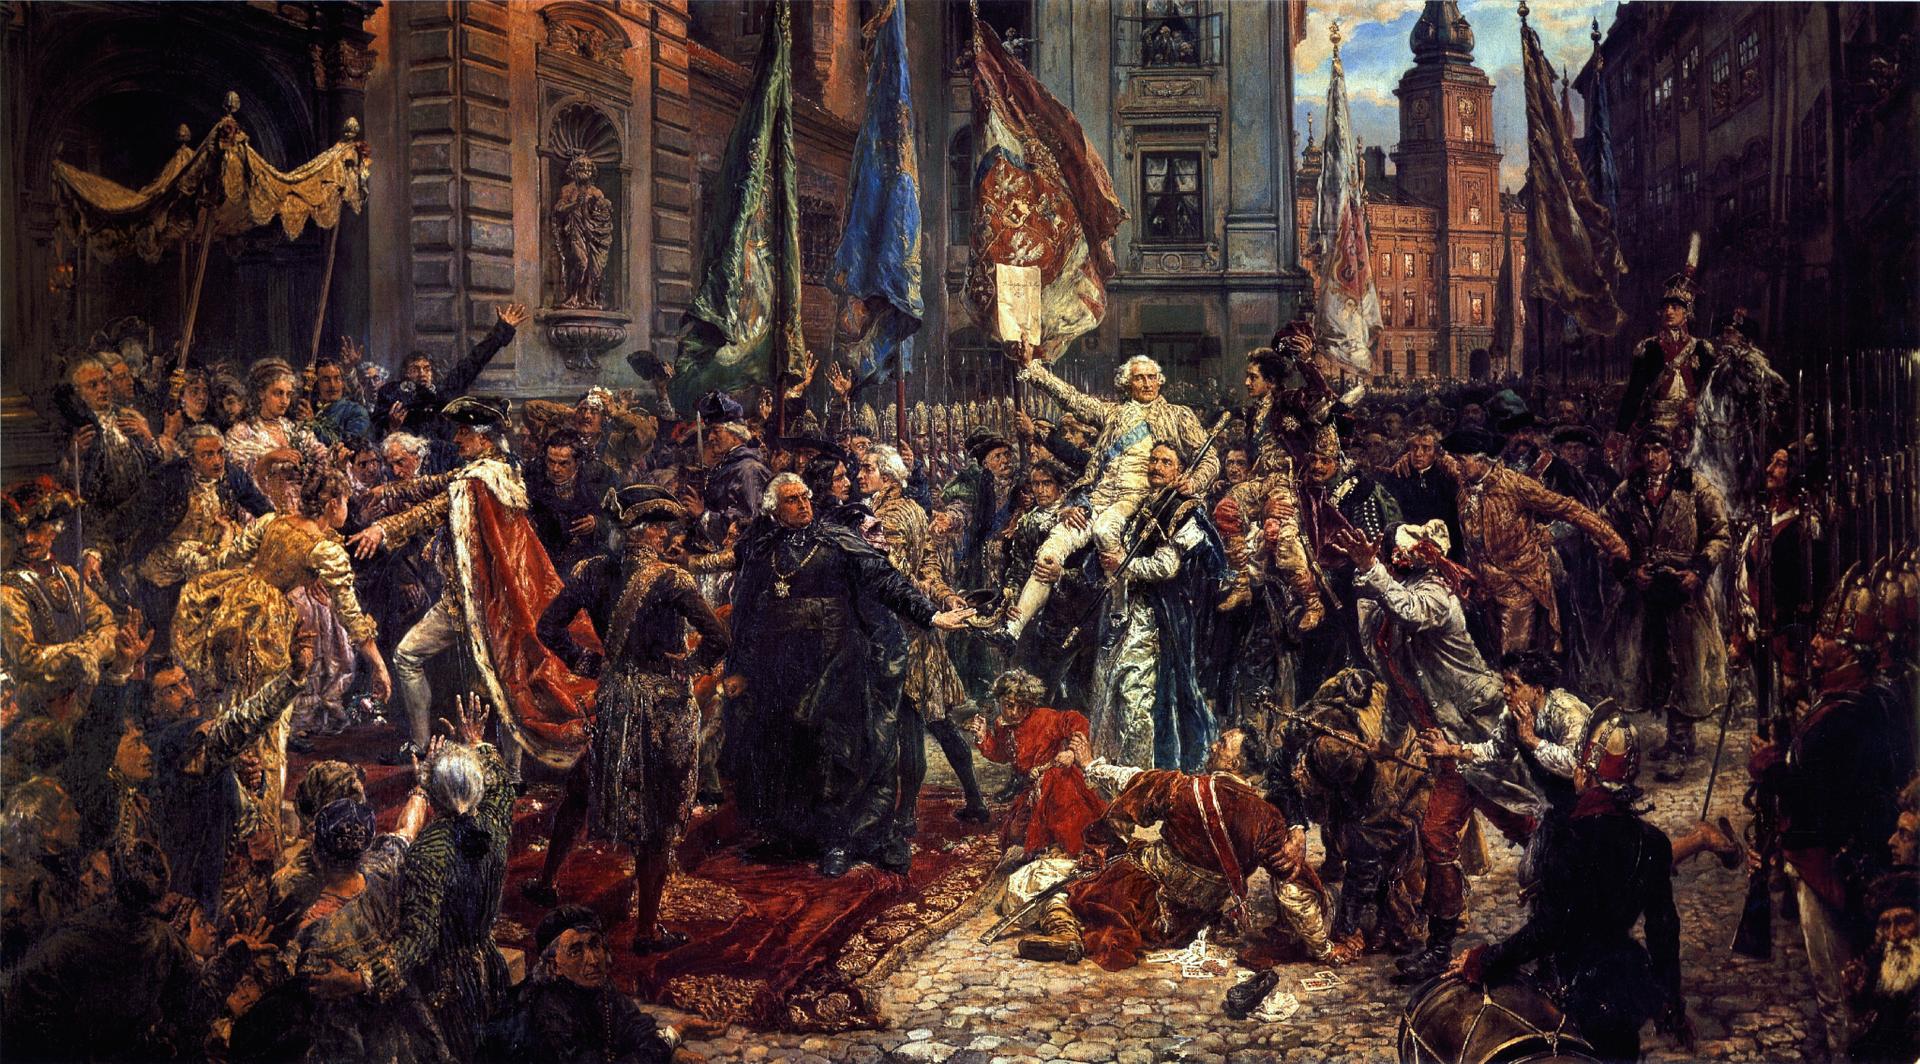 Konstytucja 3 maja Źródło: Jan Matejko, Konstytucja 3 maja, 1891, domena publiczna.